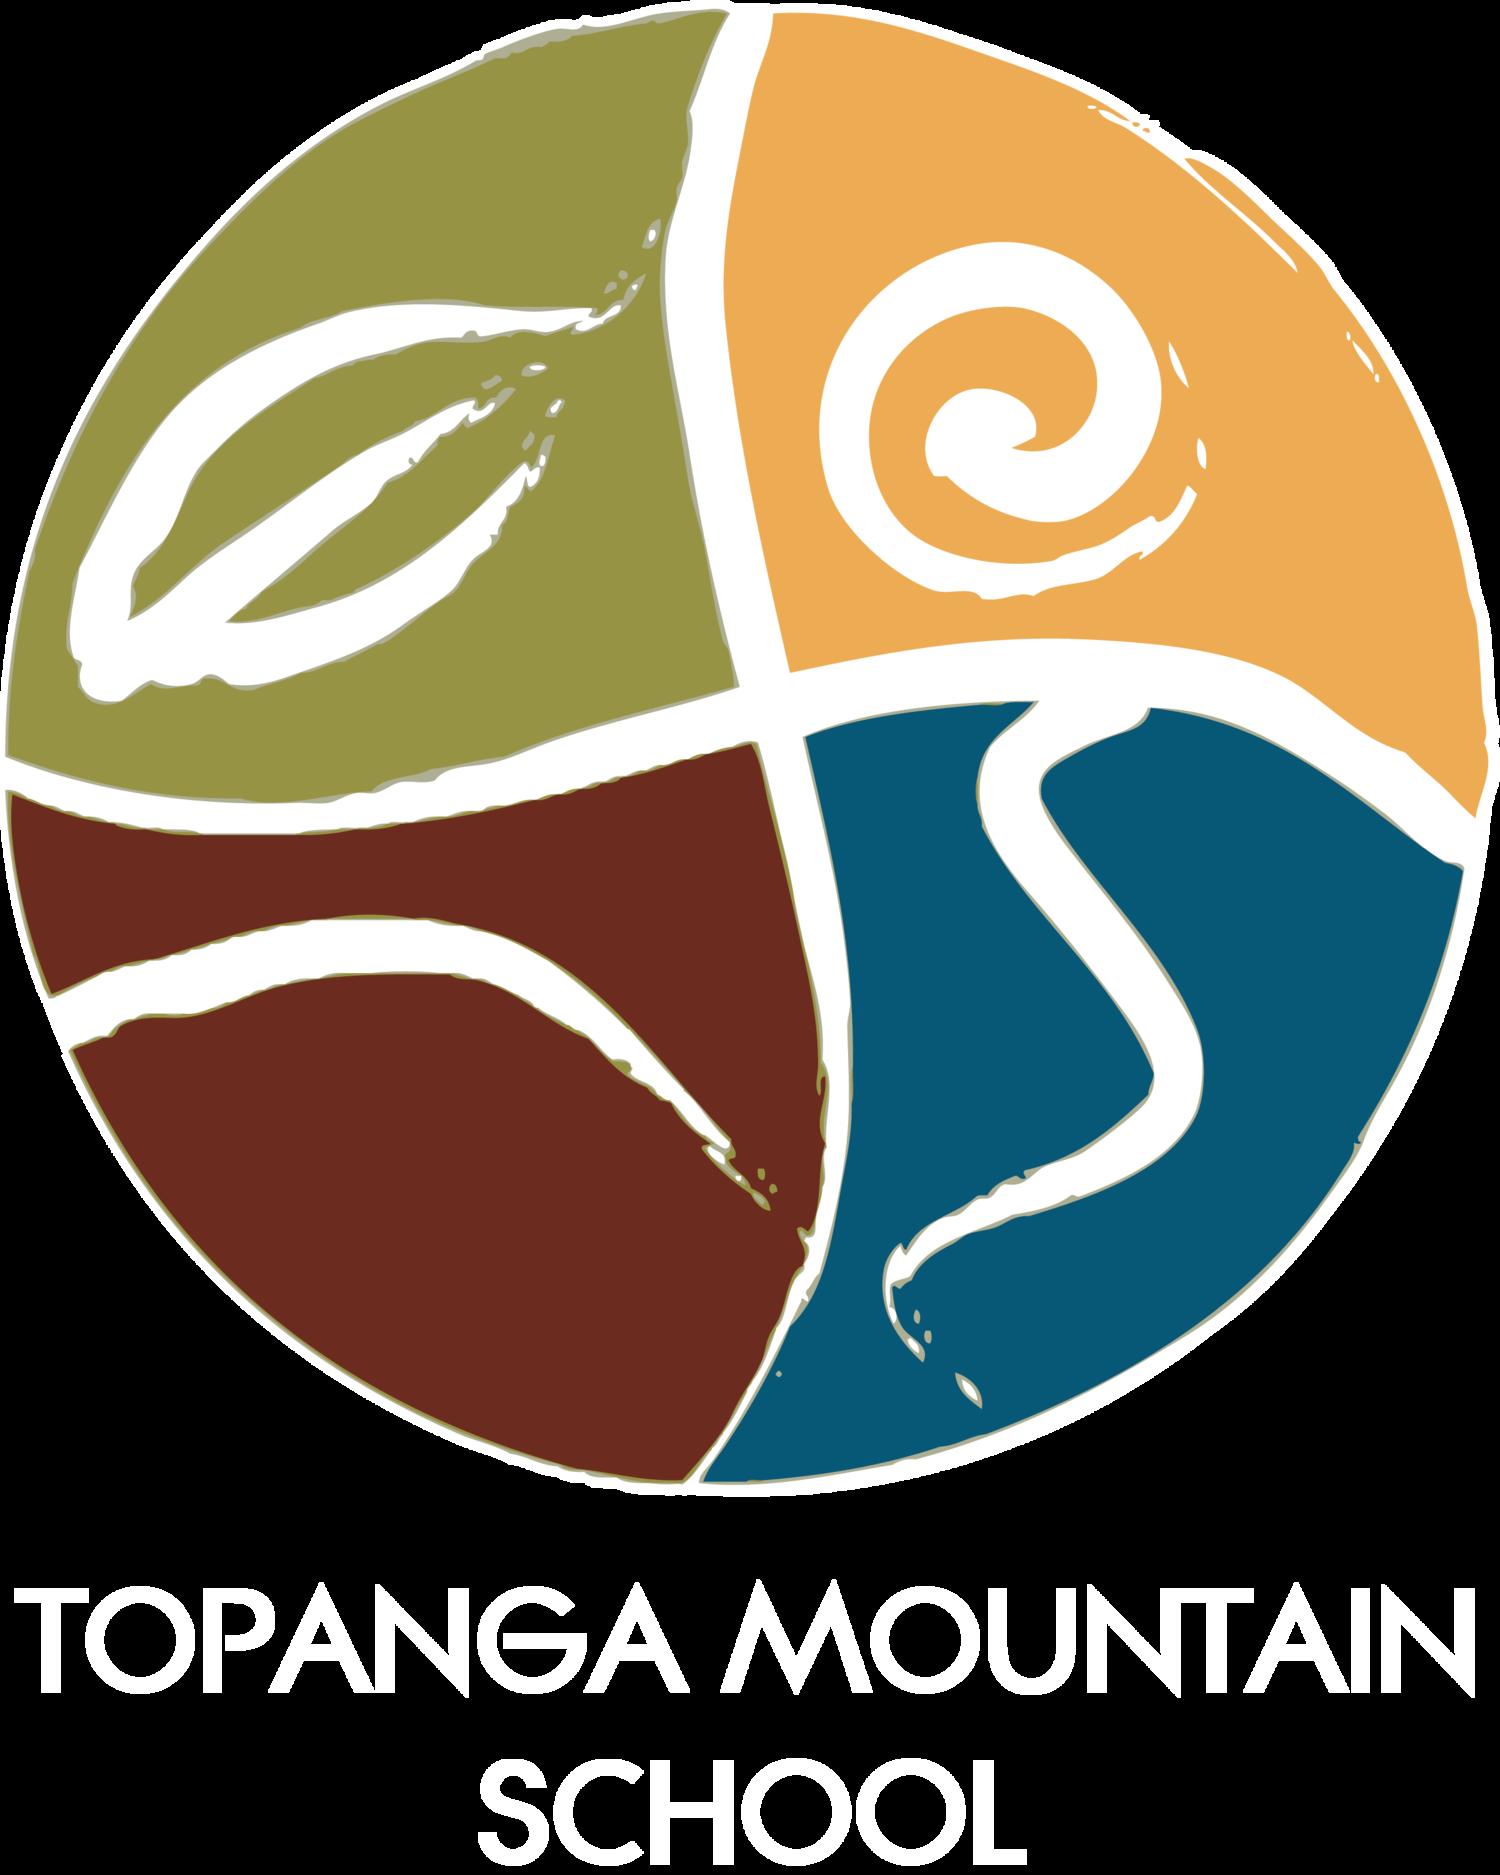 Knowledge clipart school culture. Topanga mountain